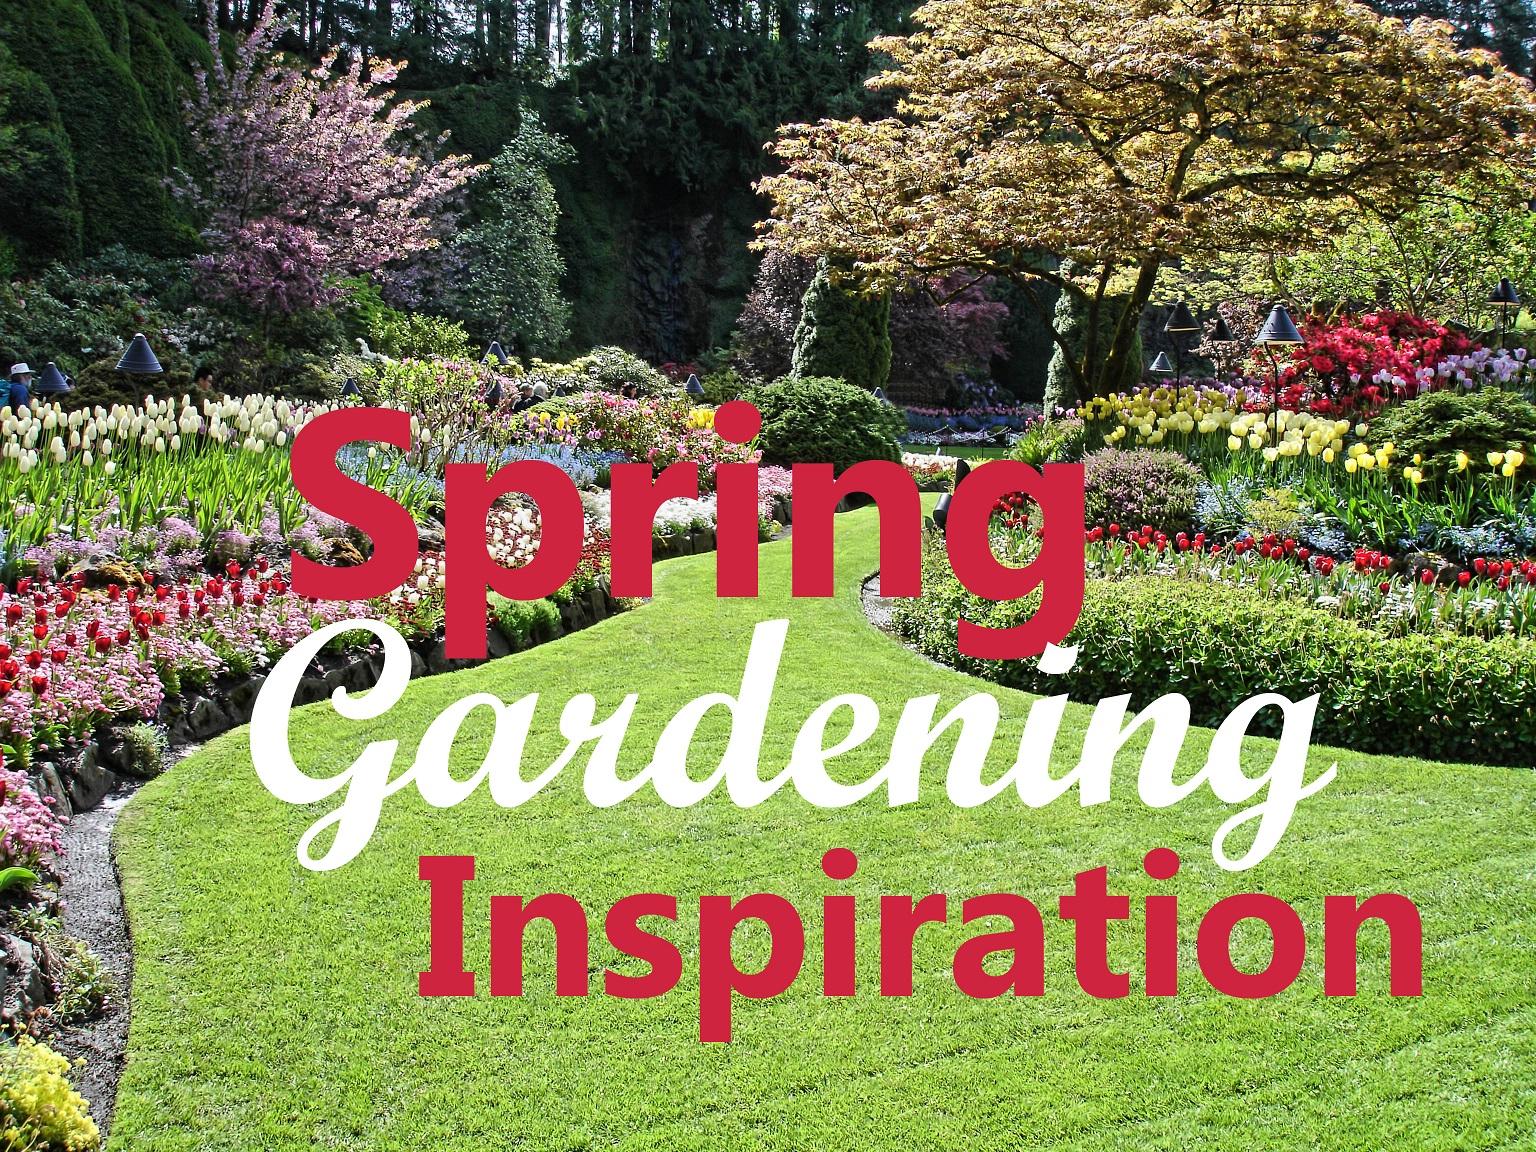 Shapely Landscape Design Ideas Your Backyard Institute Backyard Gardening Blog Your Backyard Landscape Design Ideas outdoor Backyard Gardening Blog